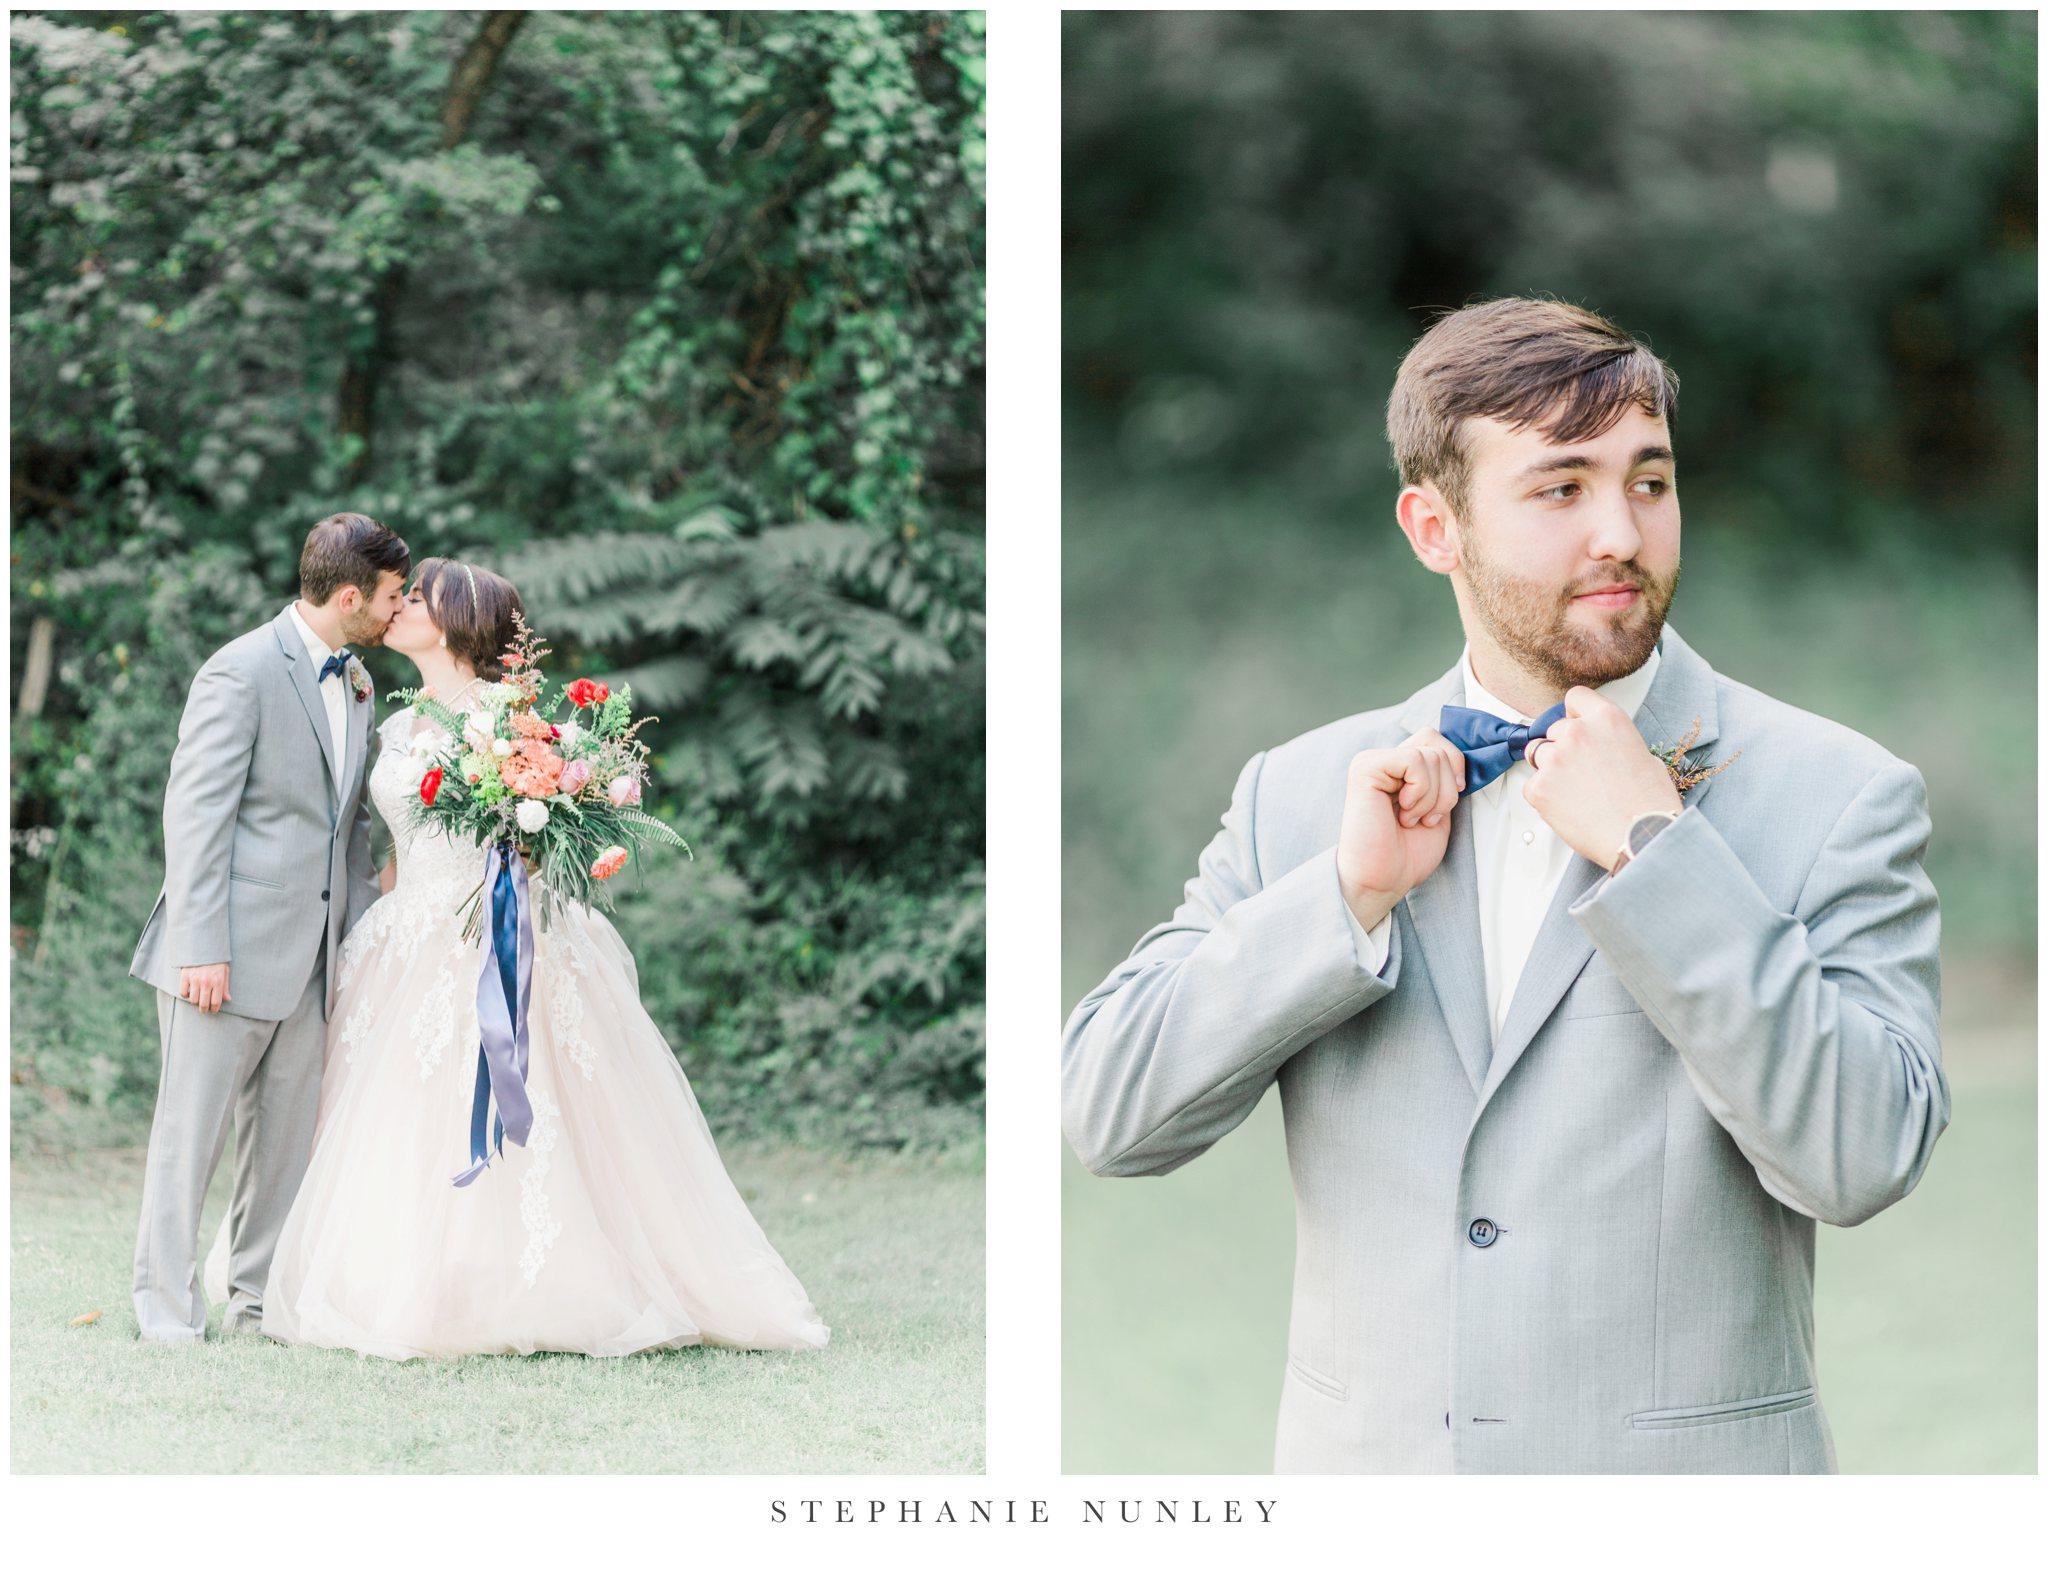 arkansas-wedding-with-lush-wildflower-bouquet-0127.jpg